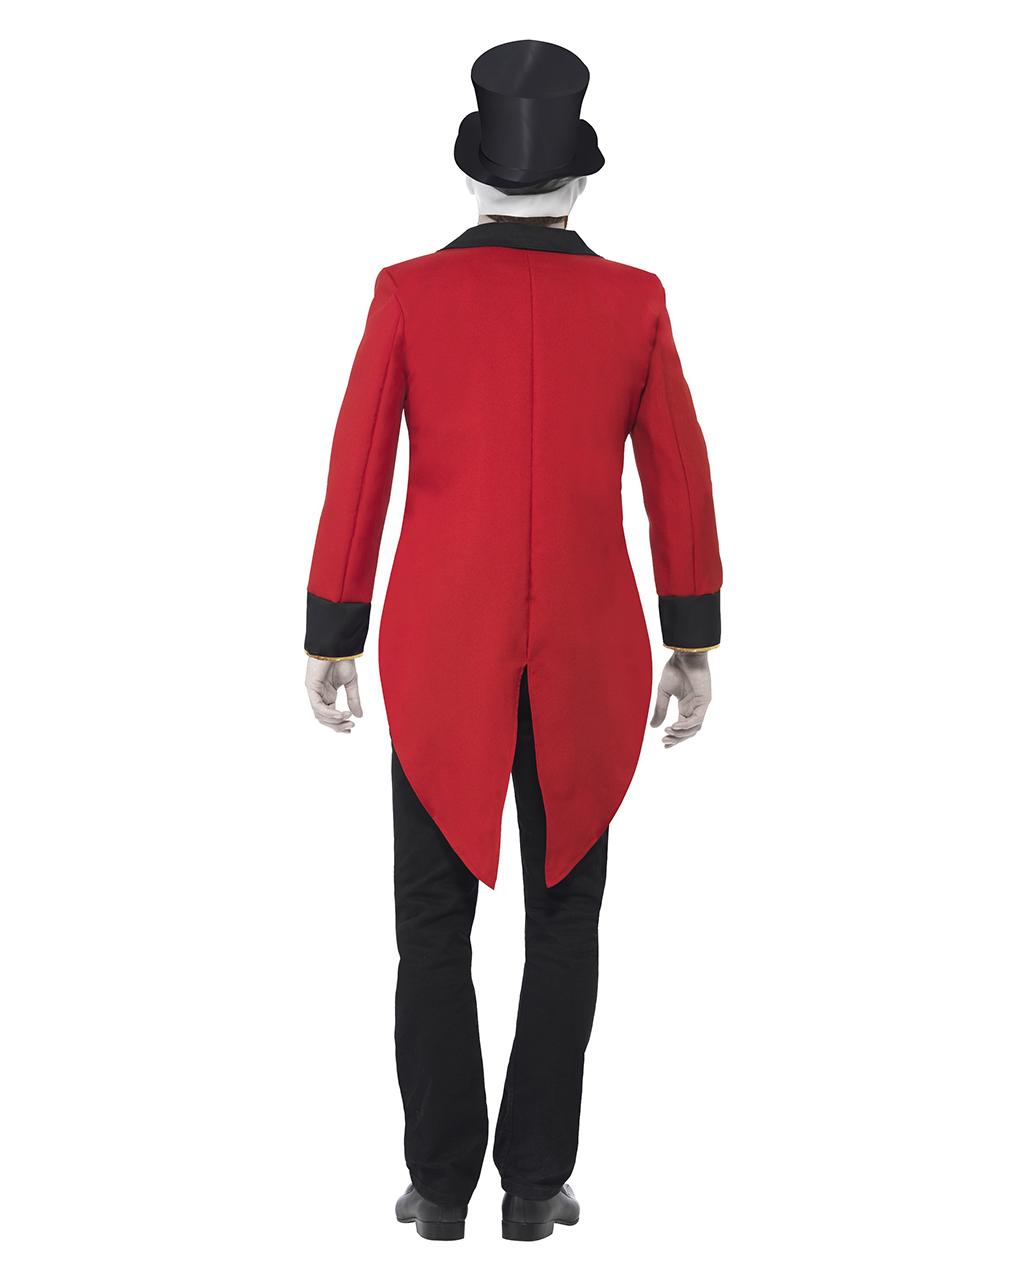 Damonischer Zirkus Direktor Kostum Halloween Horrorkostum Fur